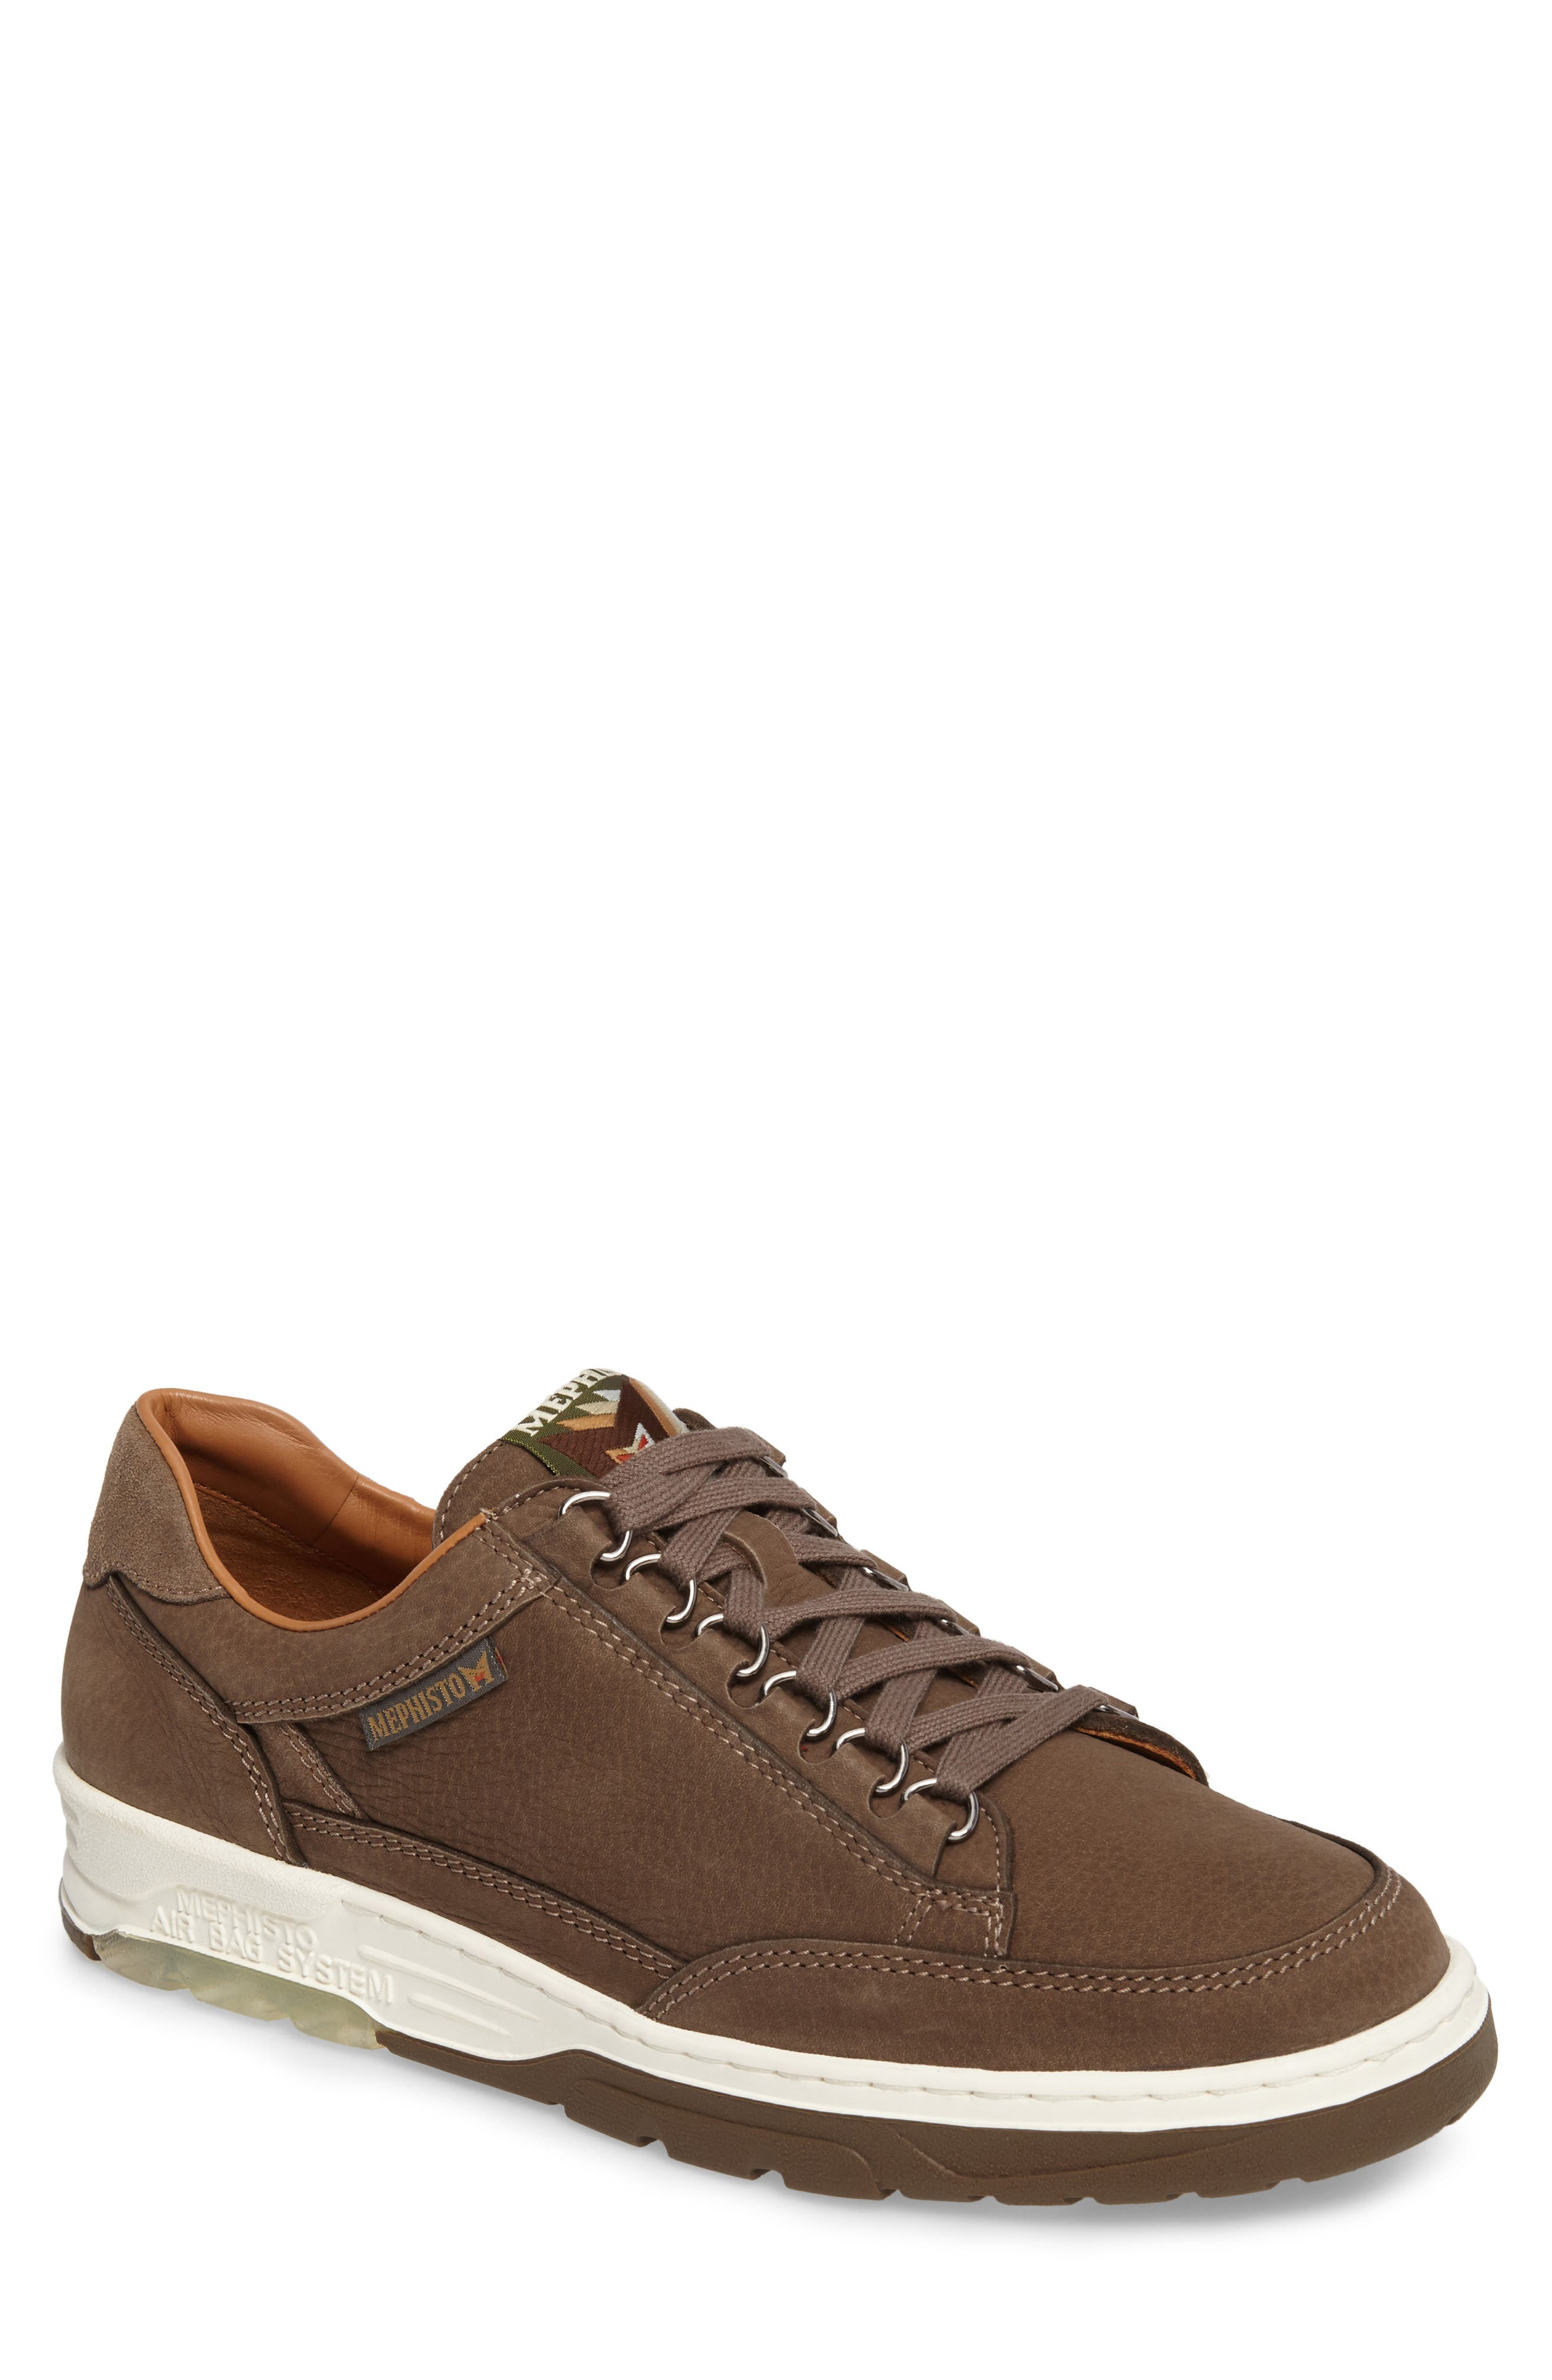 Mick Sneaker,                             Main thumbnail 3, color,